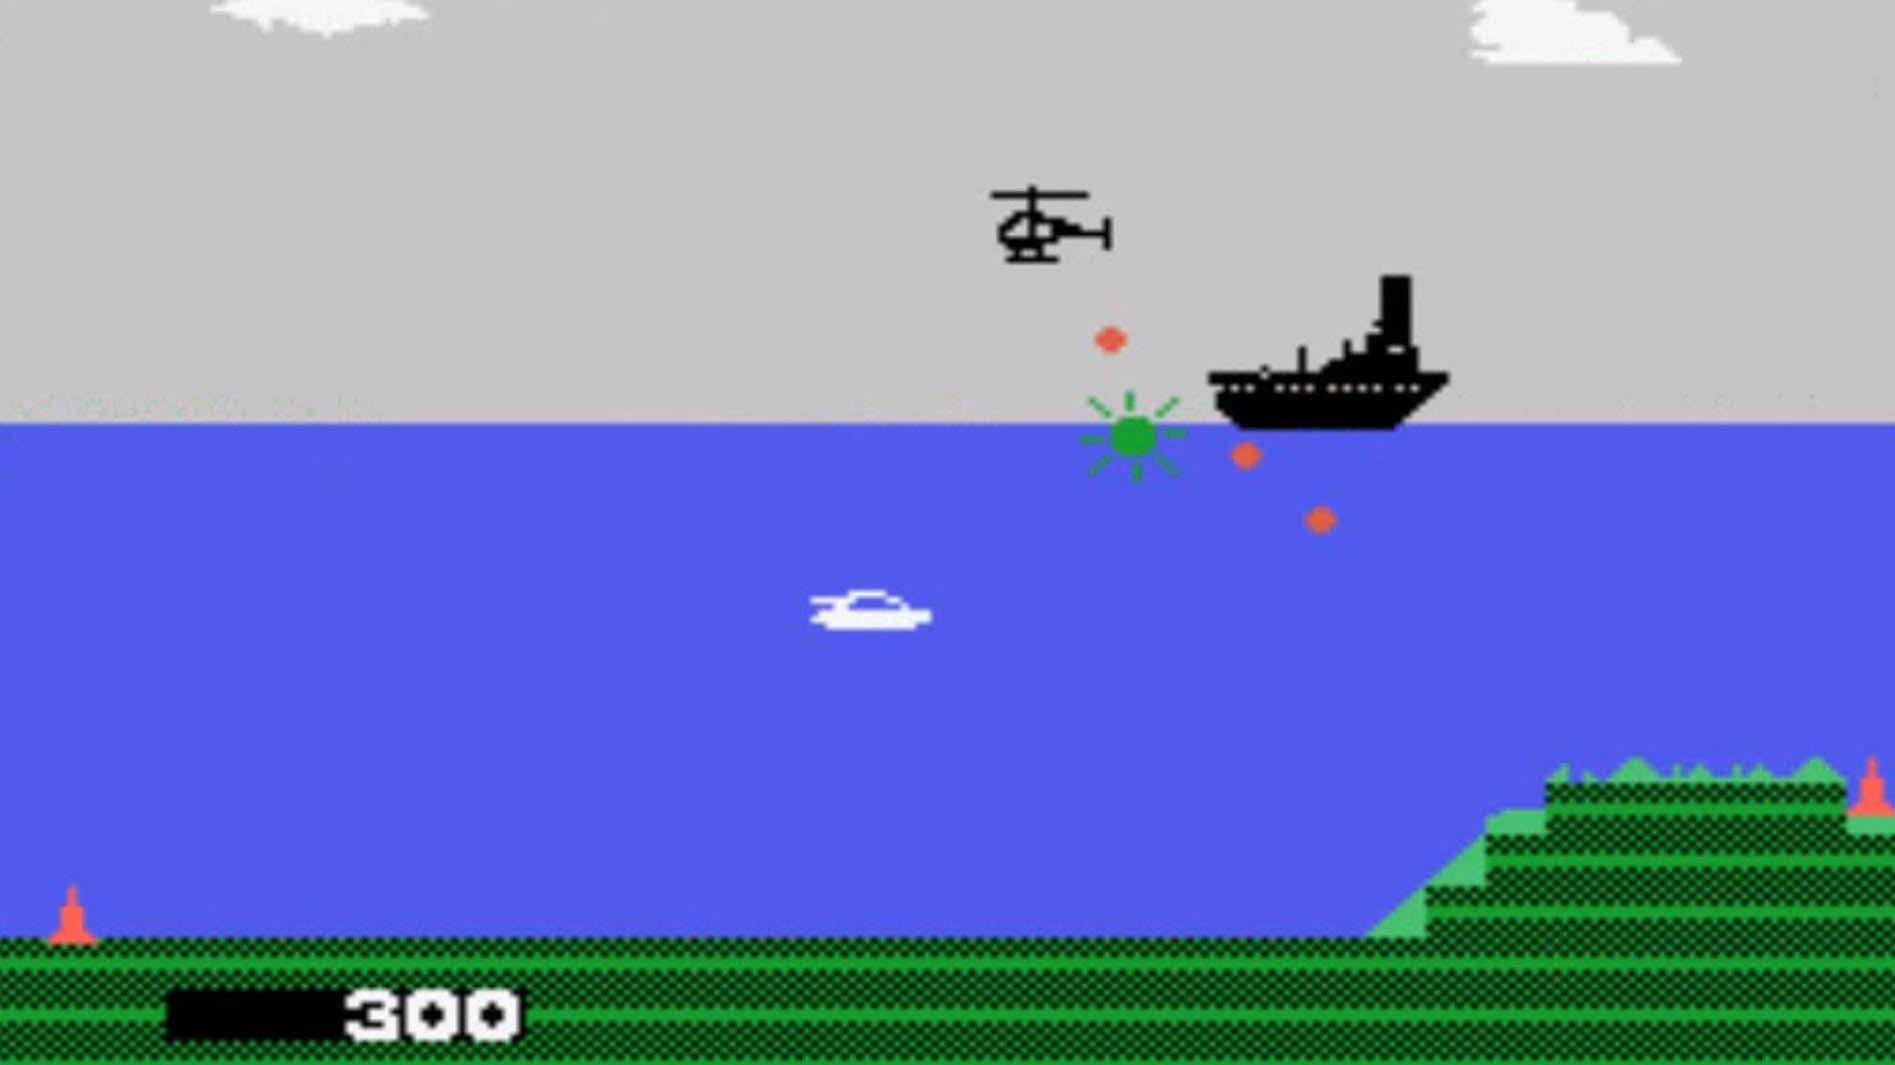 First James Bond Game - James Bond 007 - 1983